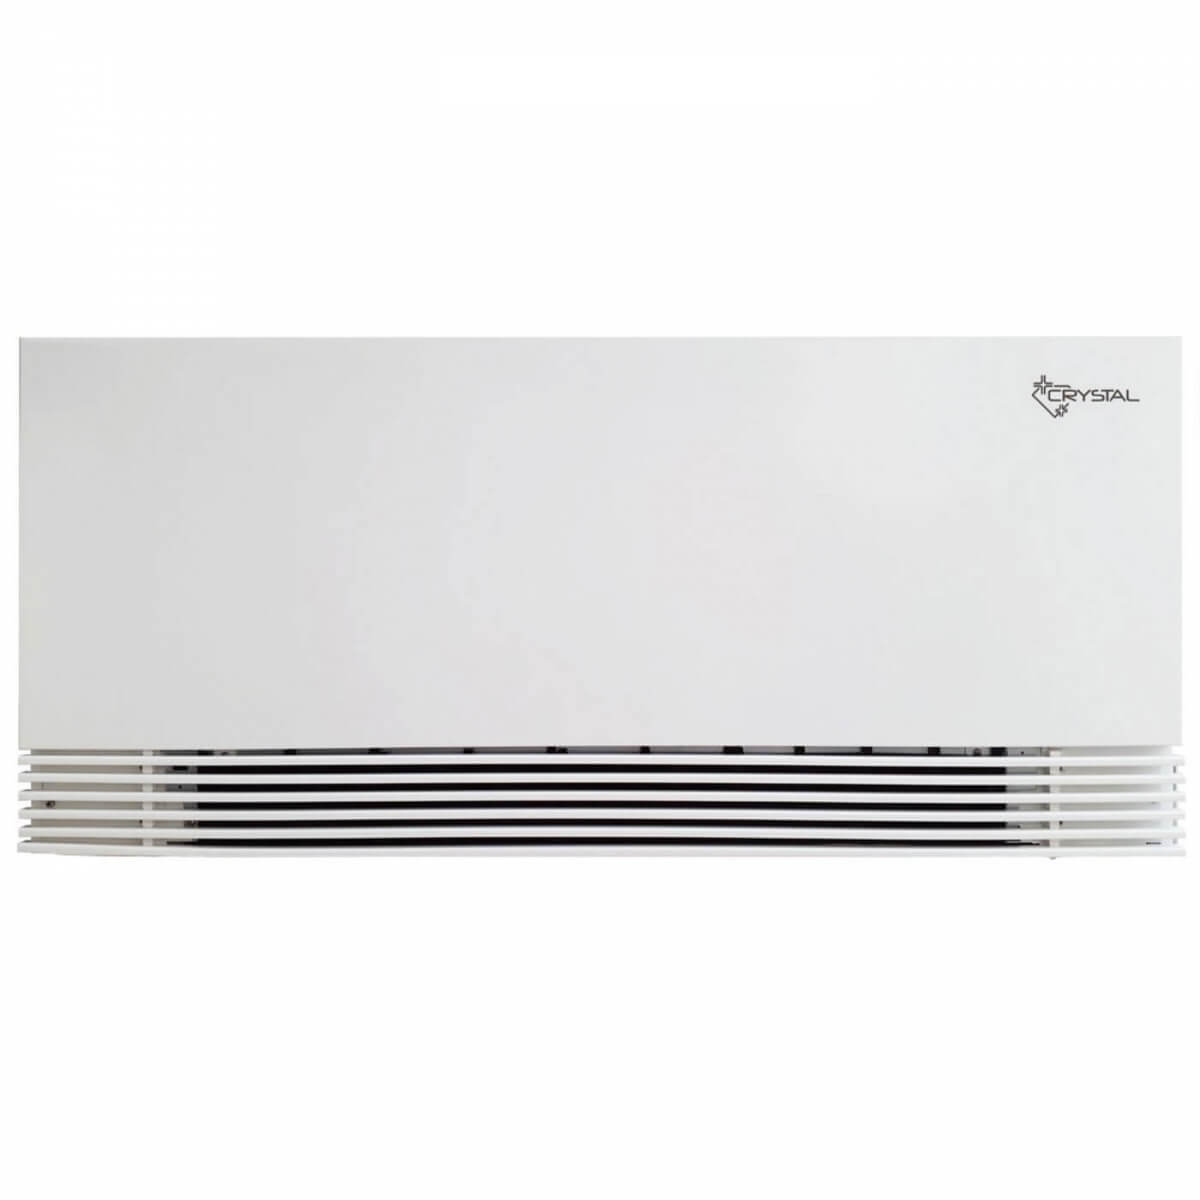 Вентилаторен конвектор Crystal BGR-600 L/R - 3